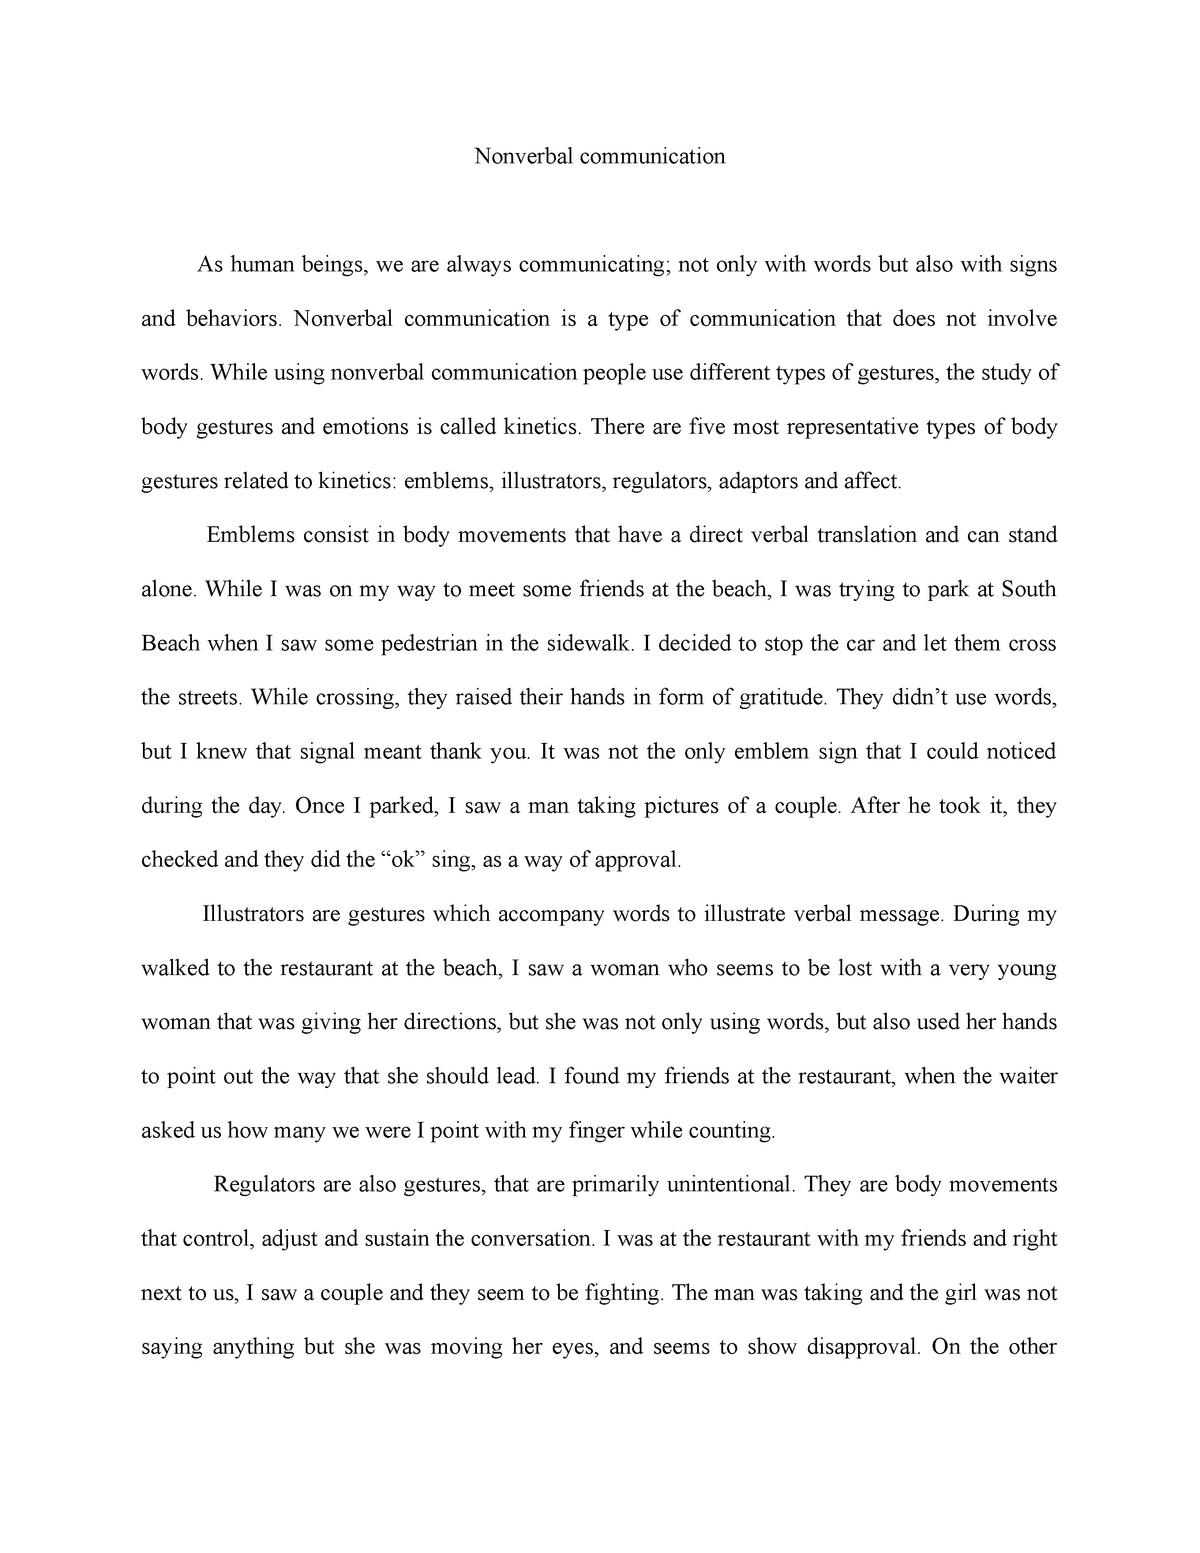 fieldwork essay kinesics